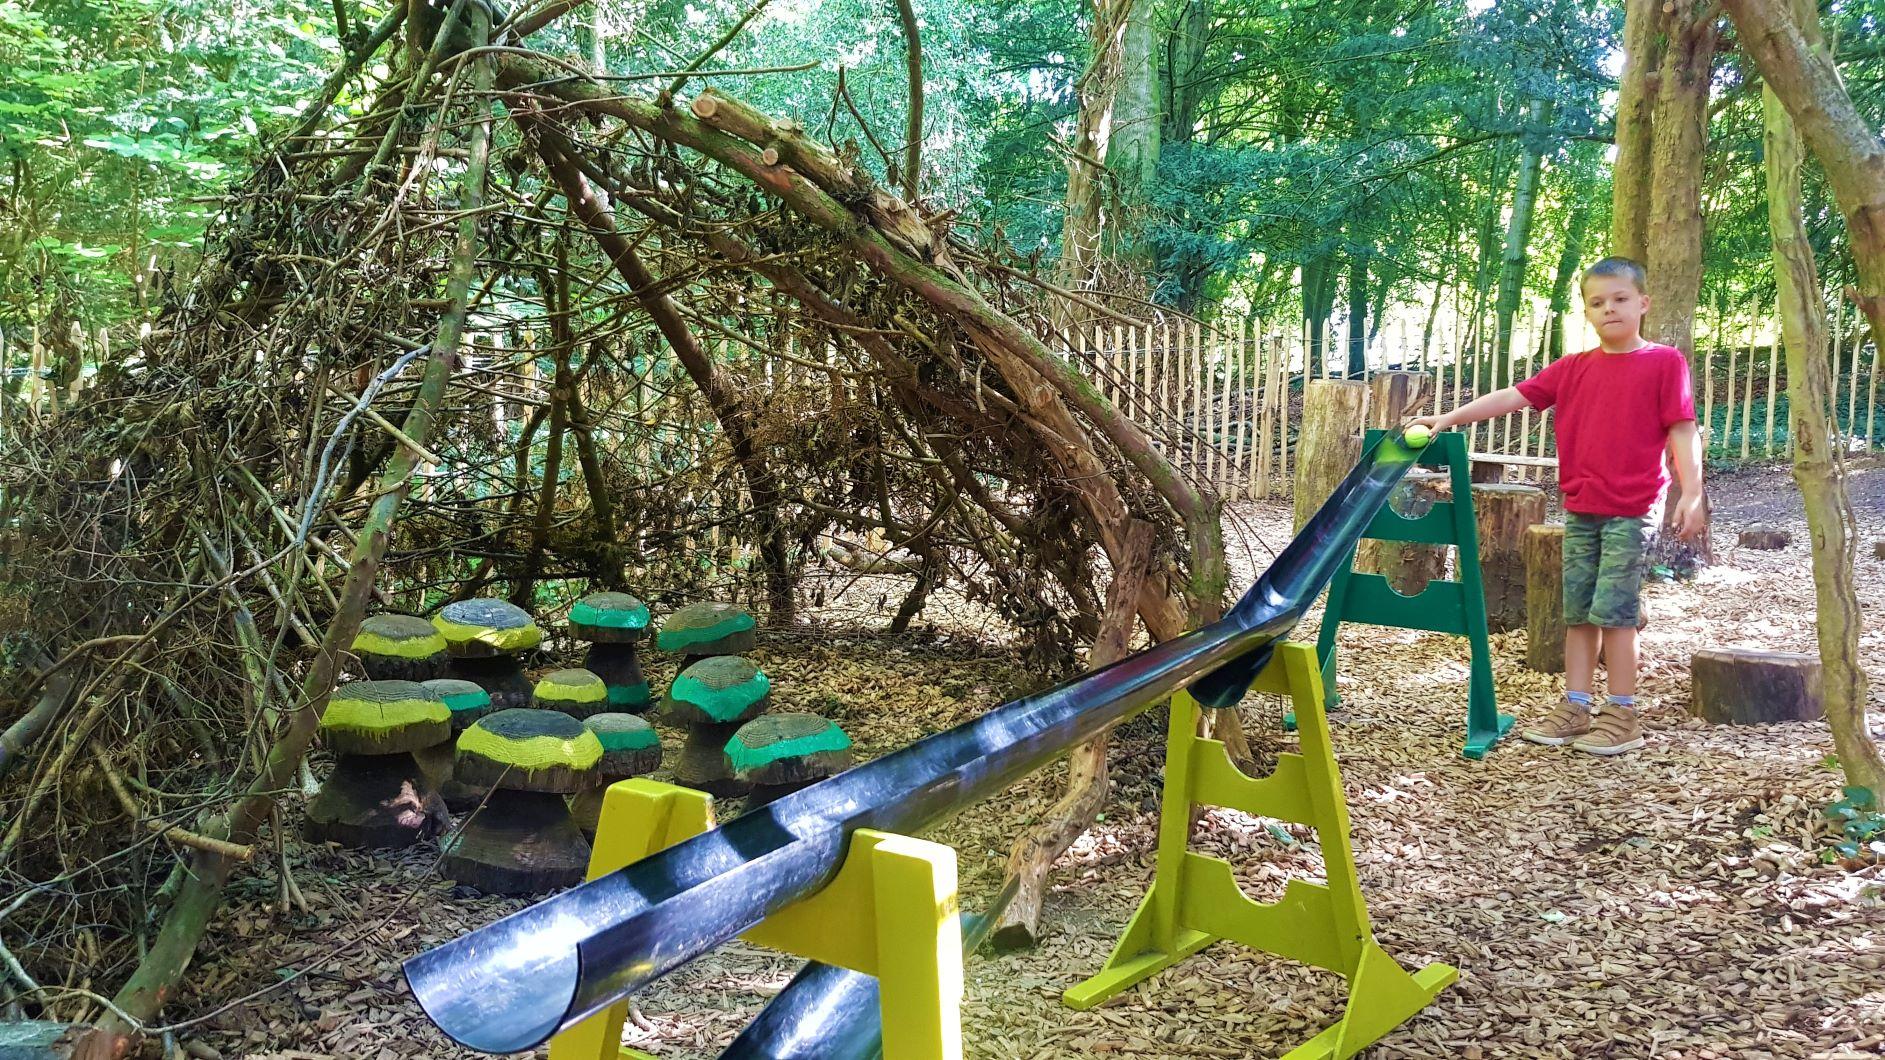 New Play area at basildon park